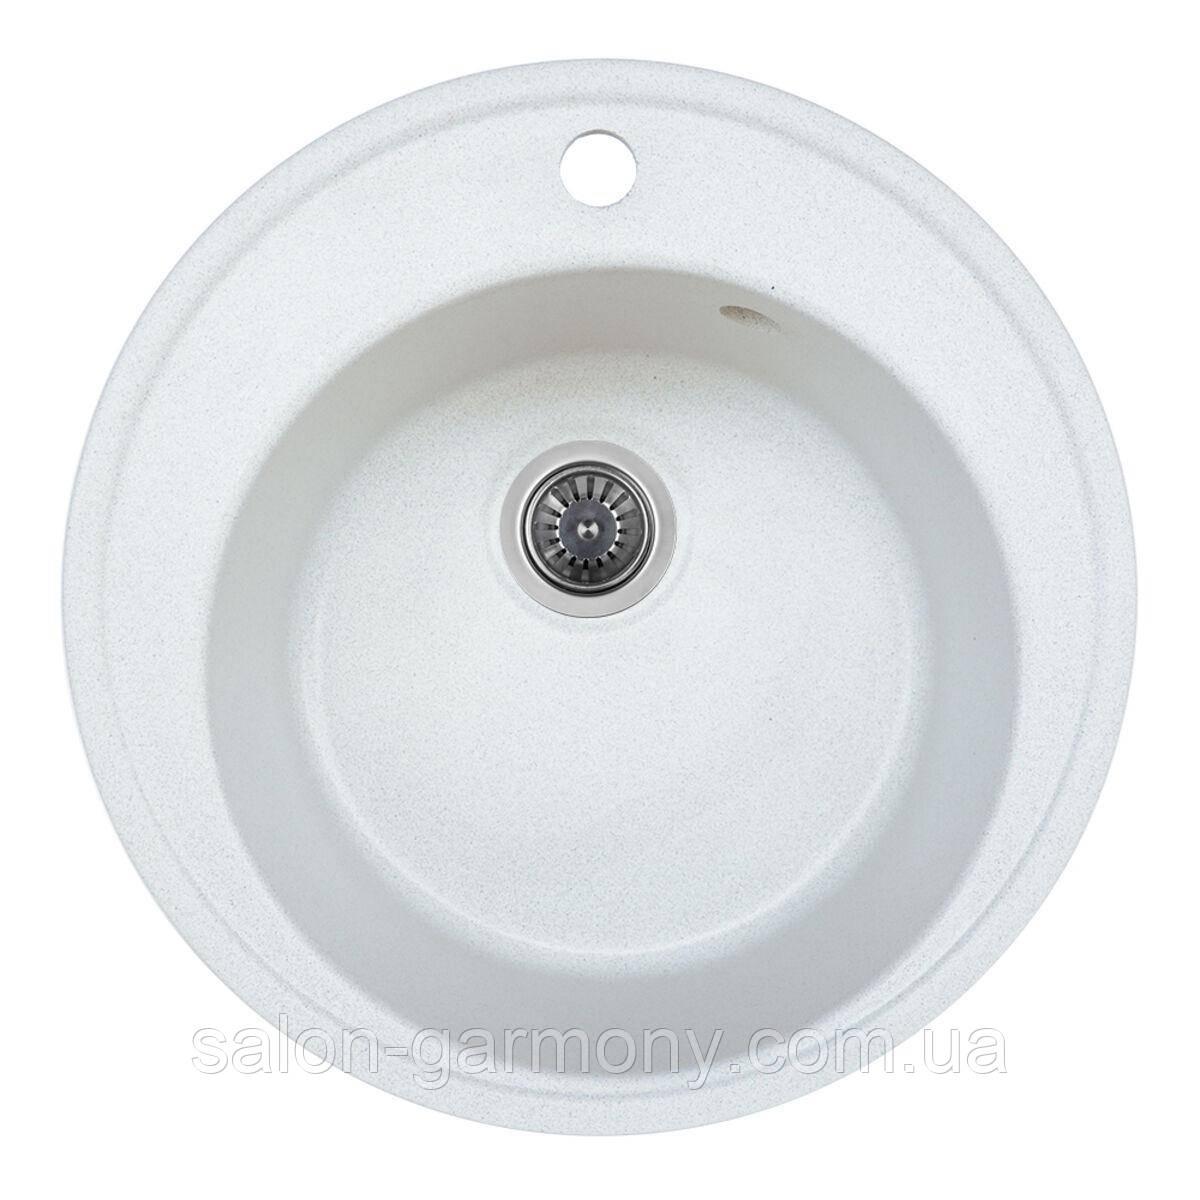 Гранітна мийка для кухні Platinum 510 YARA глянець Біла в точку